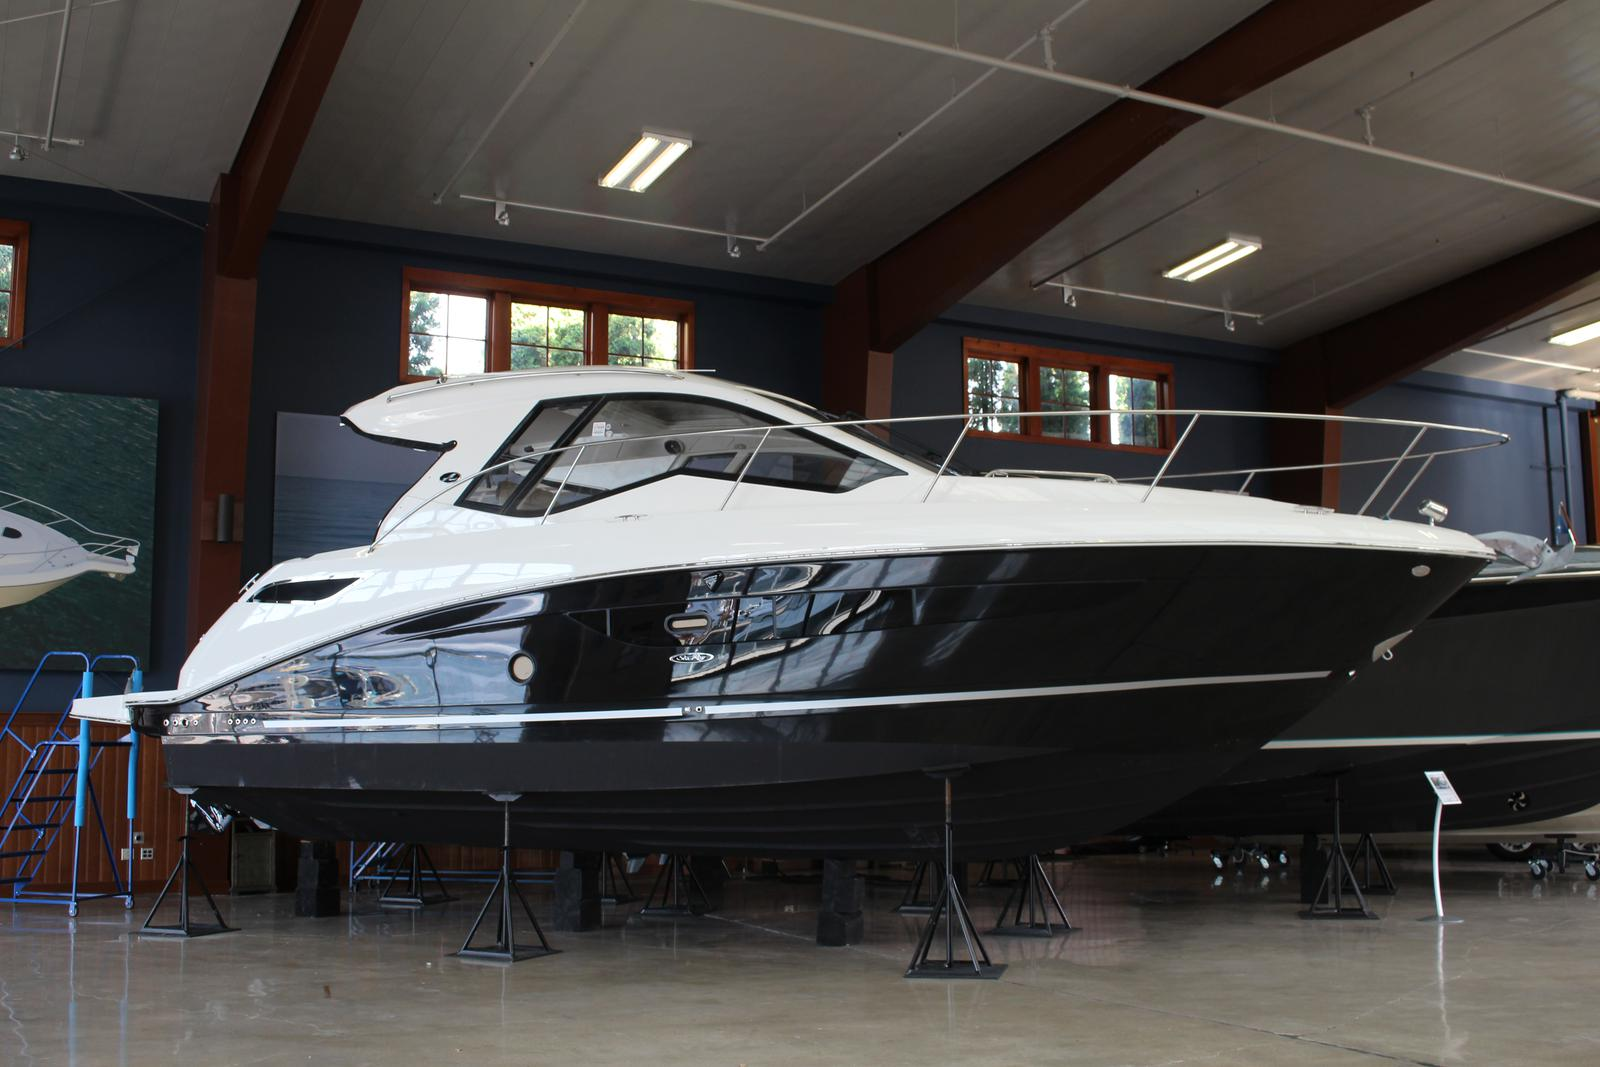 2018 Sea Ray Sundancer 350 Coupe for sale in Harbor Springs, MI